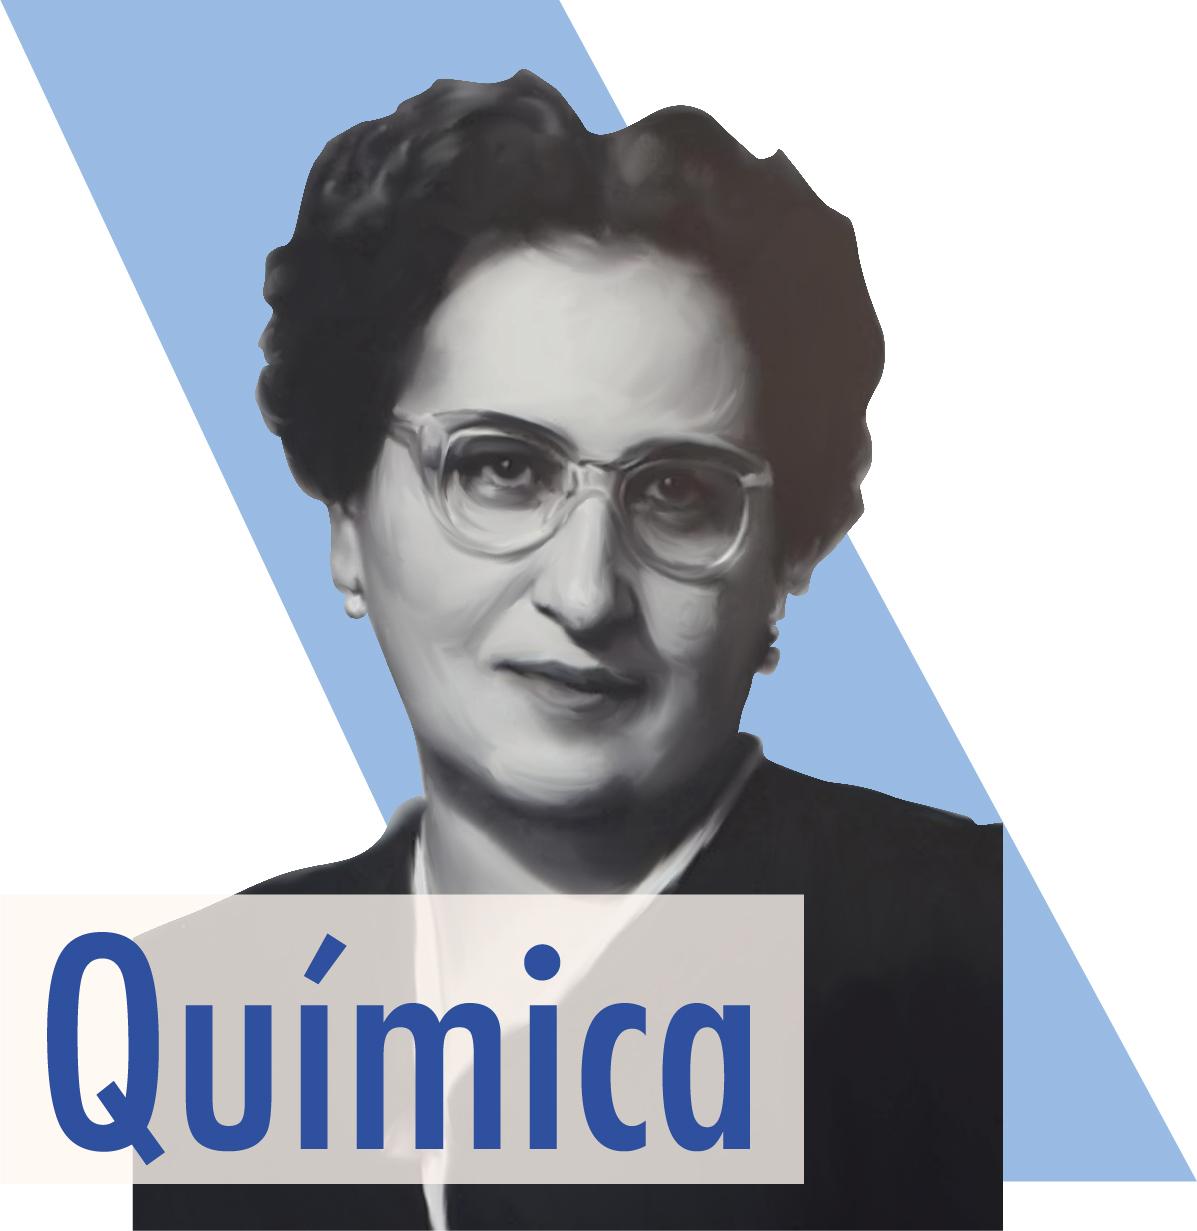 María Teresa Salazar Bermúdez (Villanueva del Ariscal, Sevilla; 1909 – Madrid, 1982)